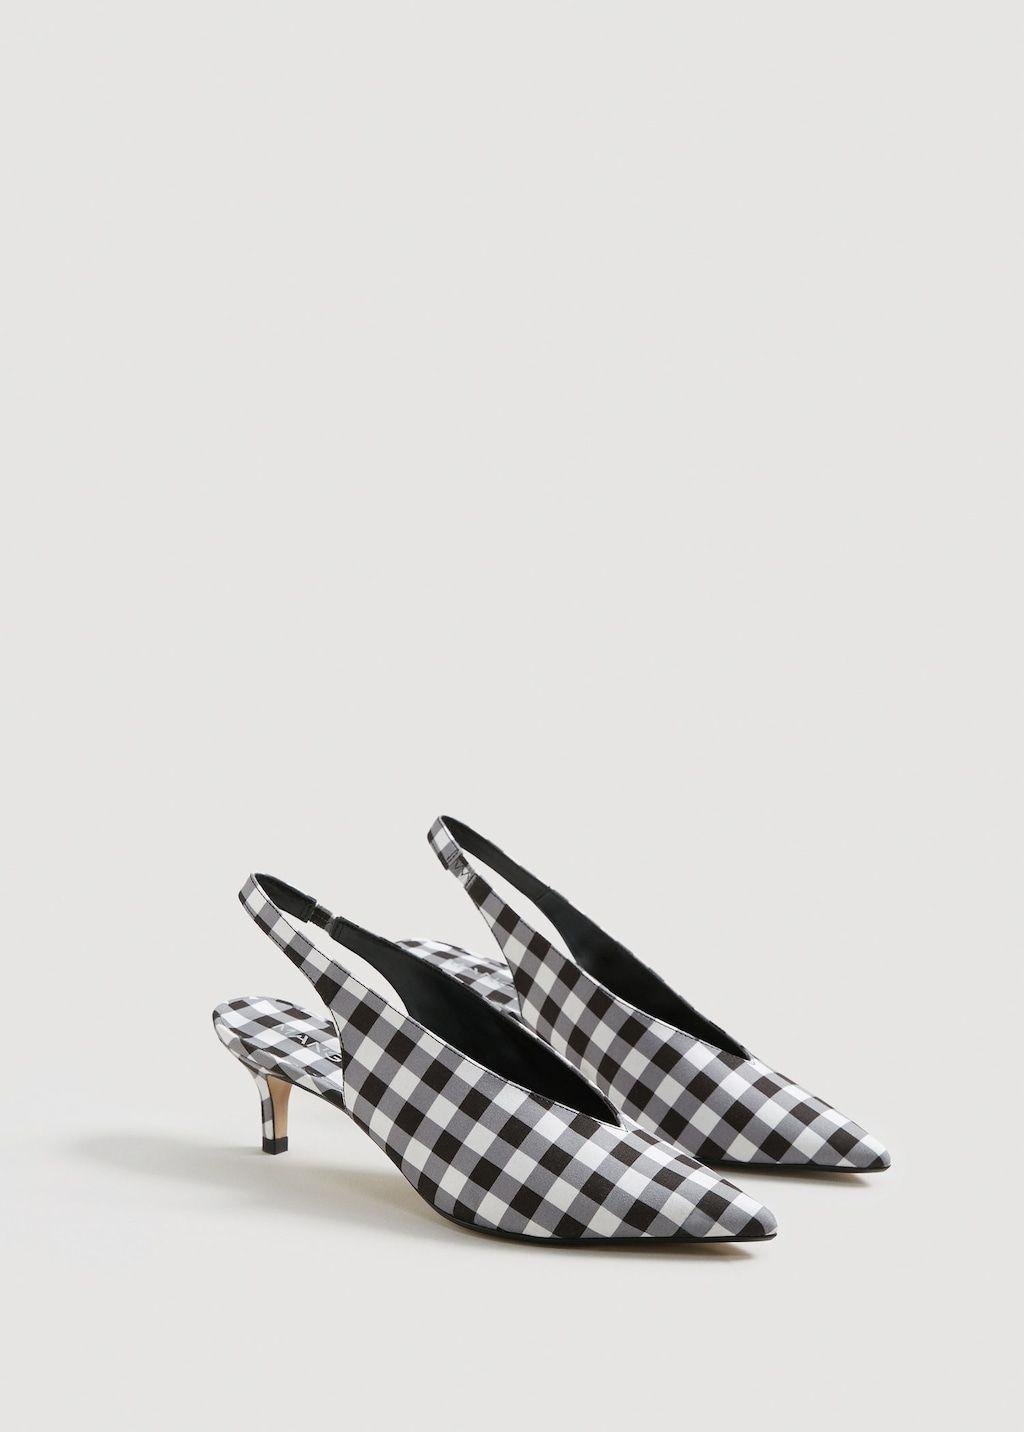 Slingback Mit Karomuster Damen Mango Deutschland Shoes Women Shoes Slingback